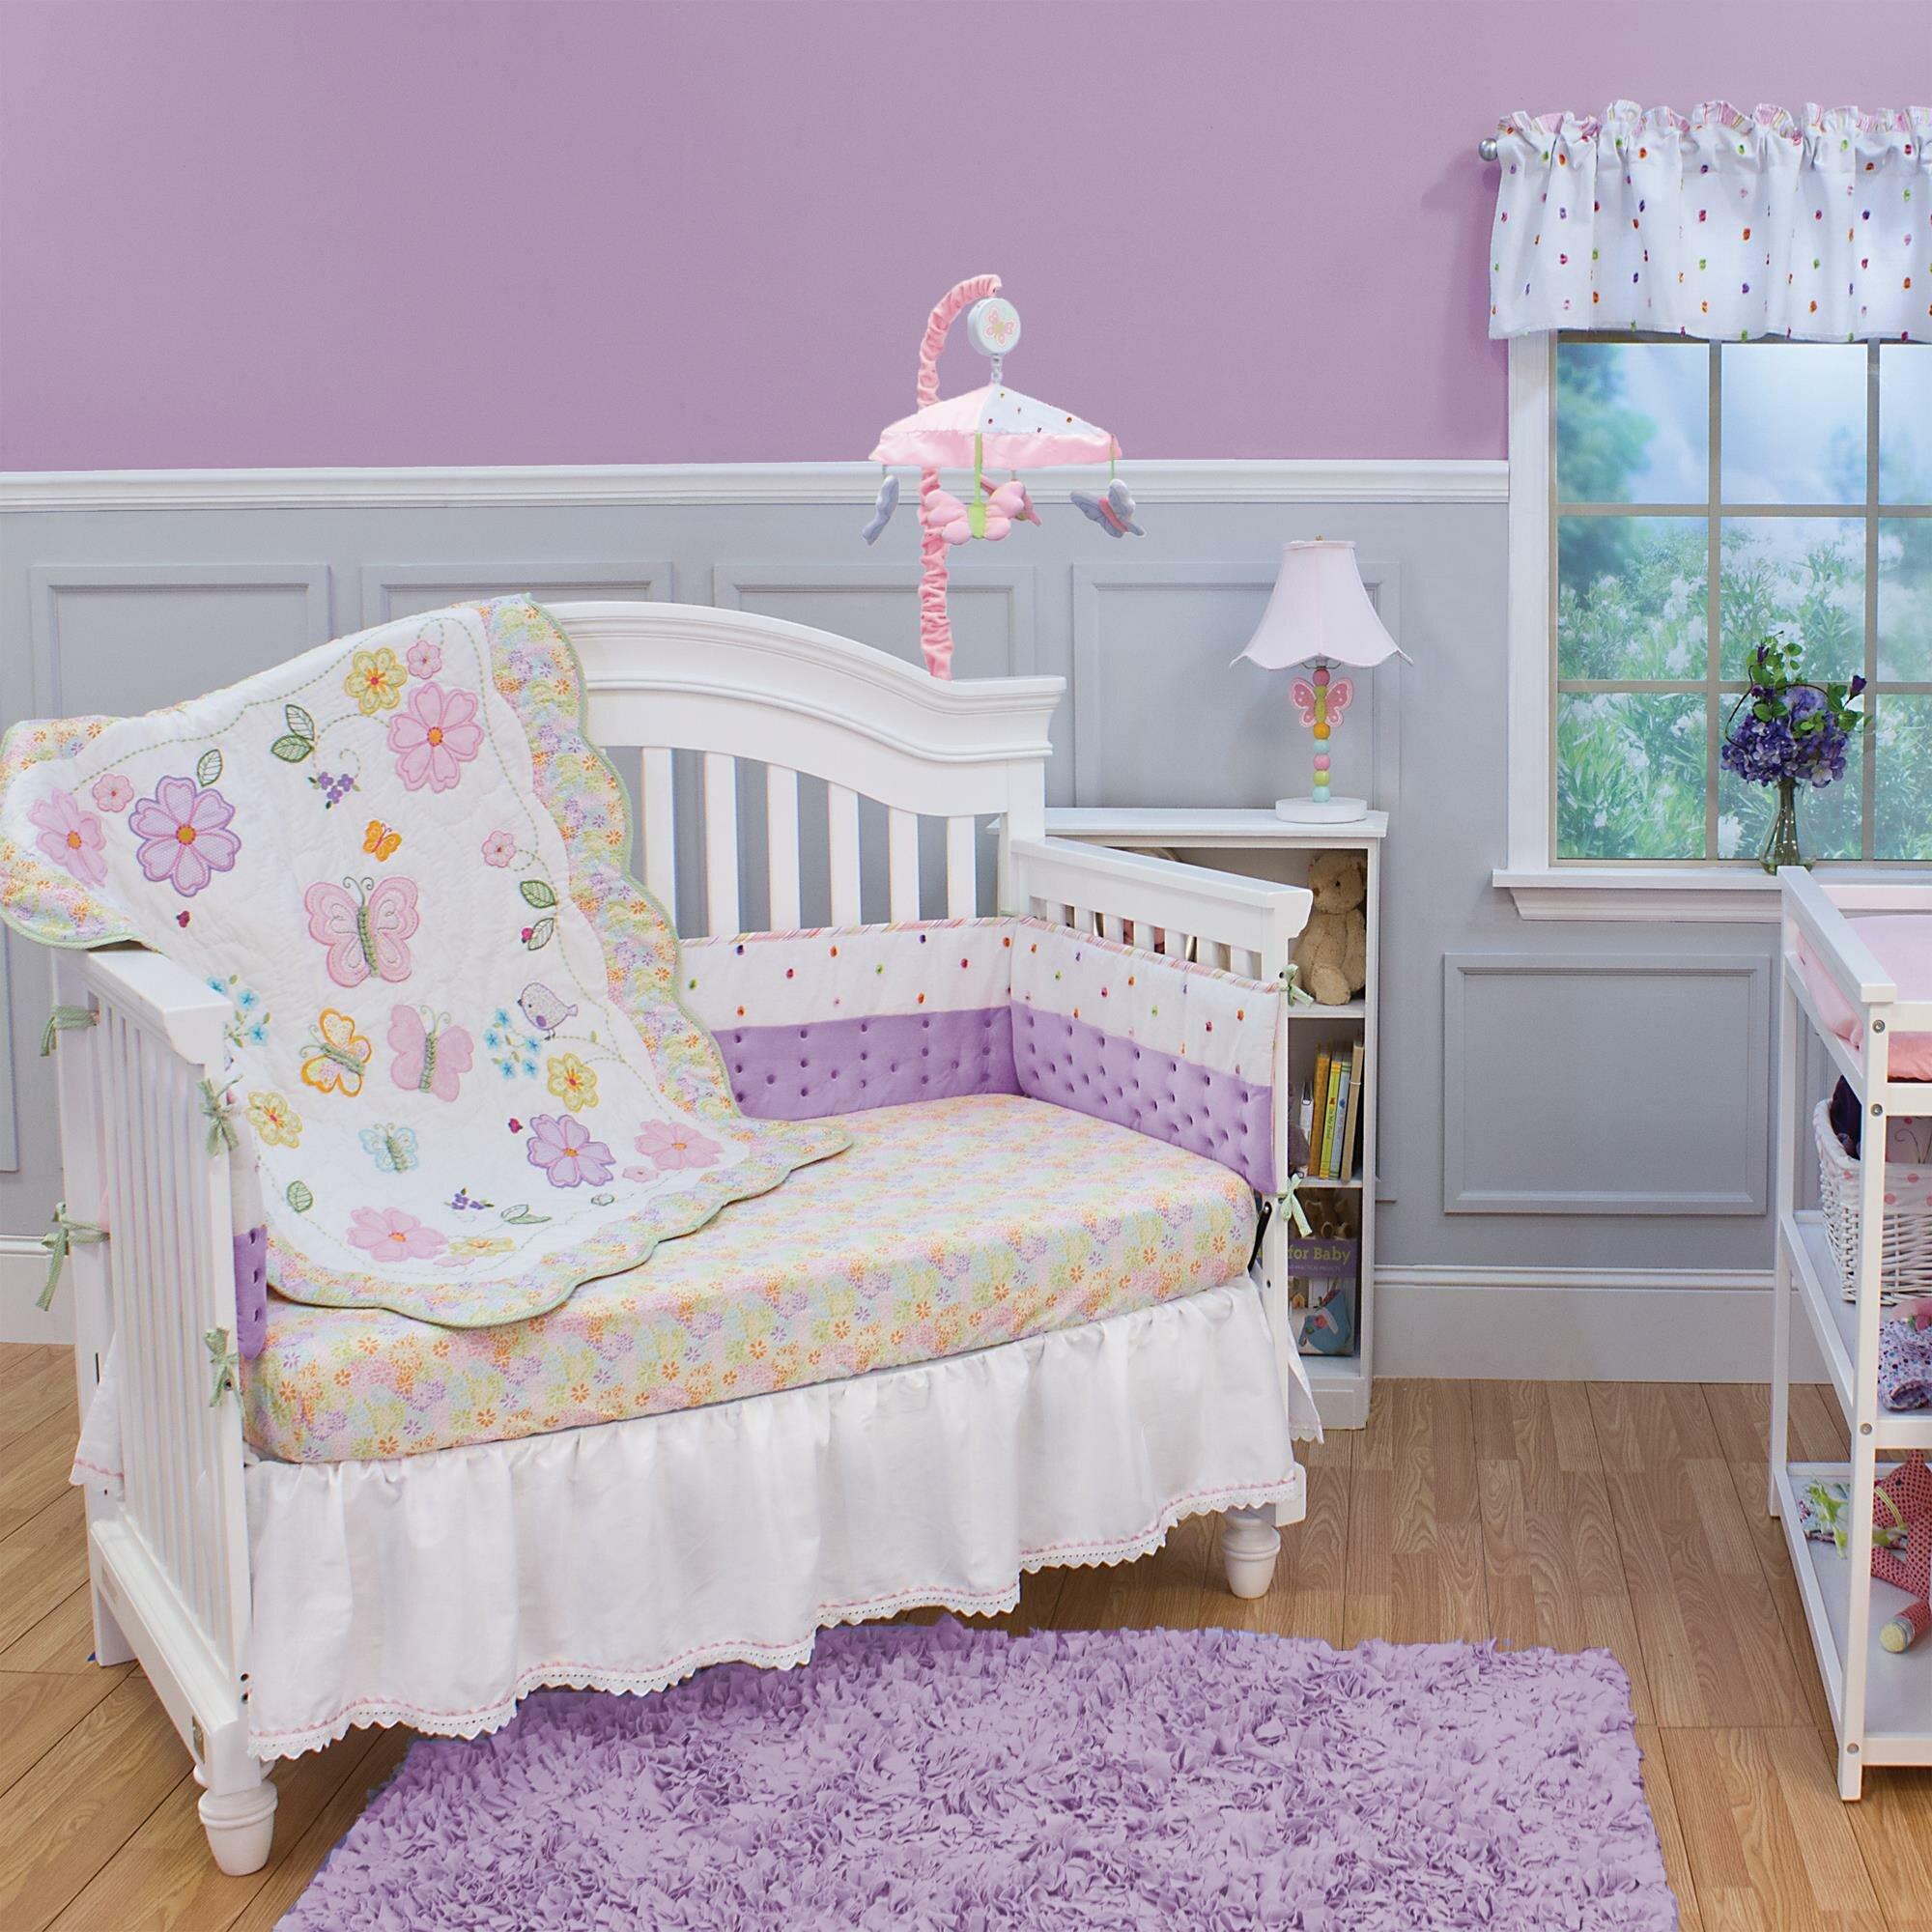 Butterfly Garden 3 Piece Crib Bedding Set